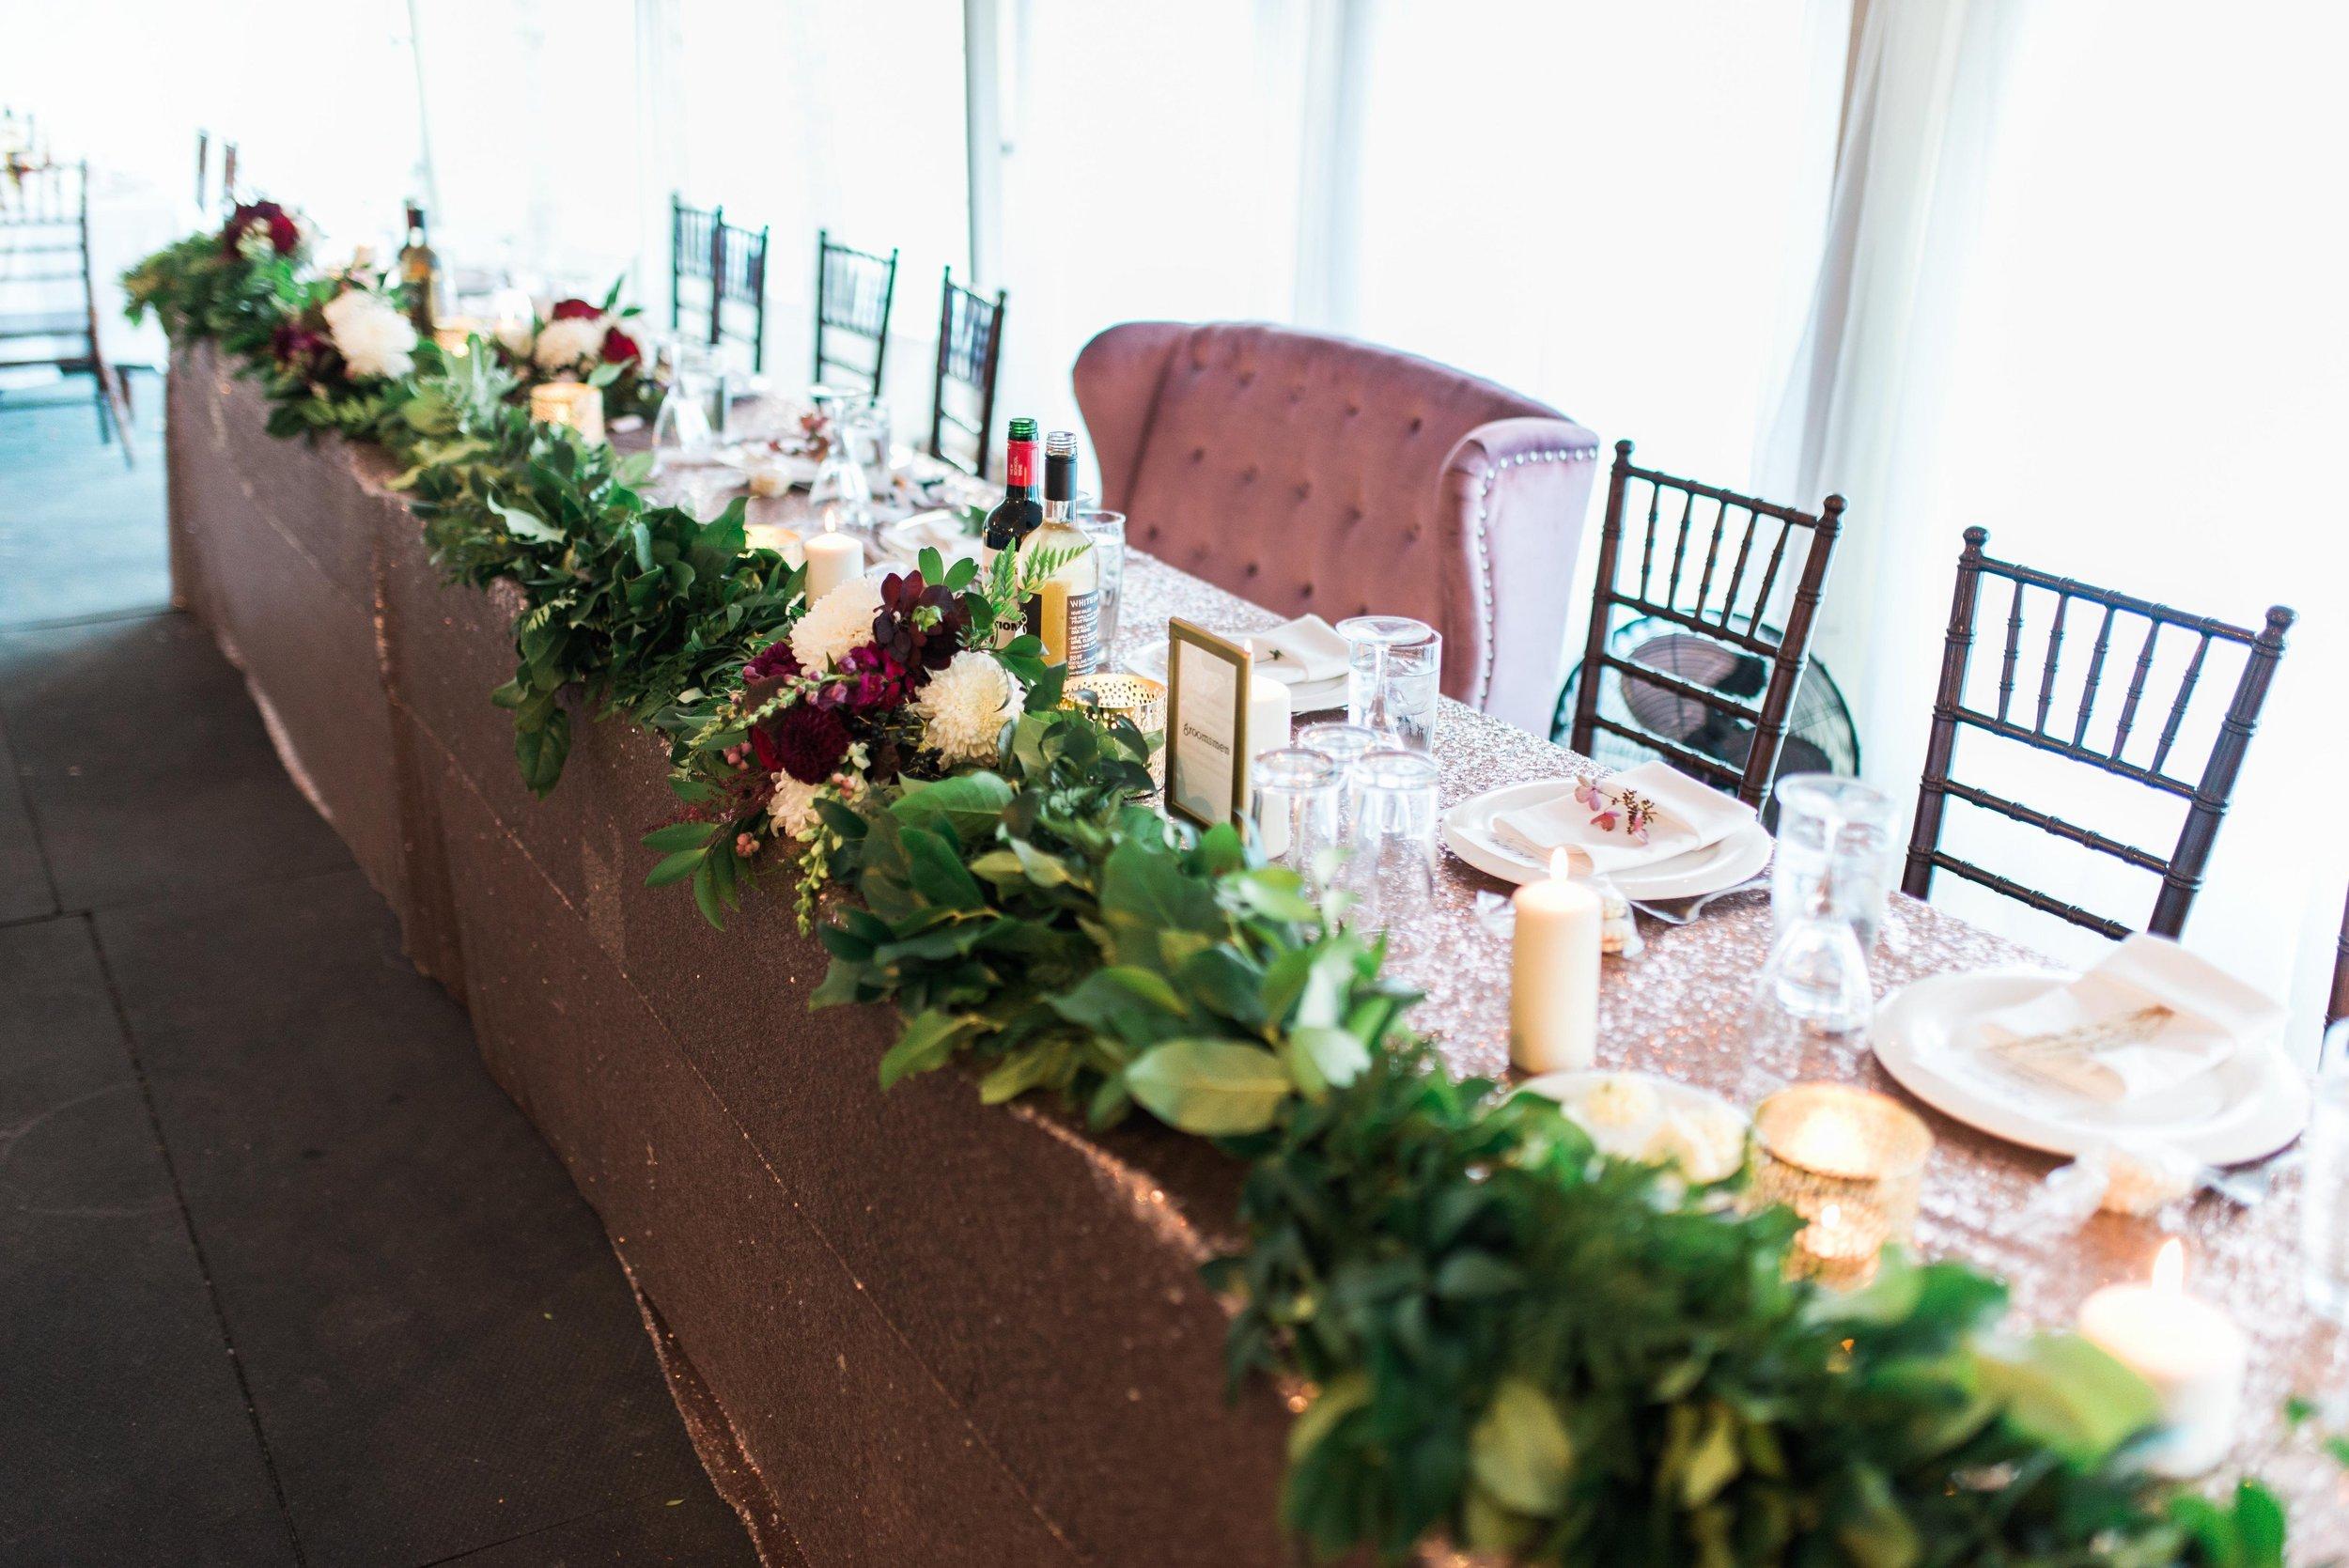 Head Table Greenery Garland - Tent Wedding Decorations